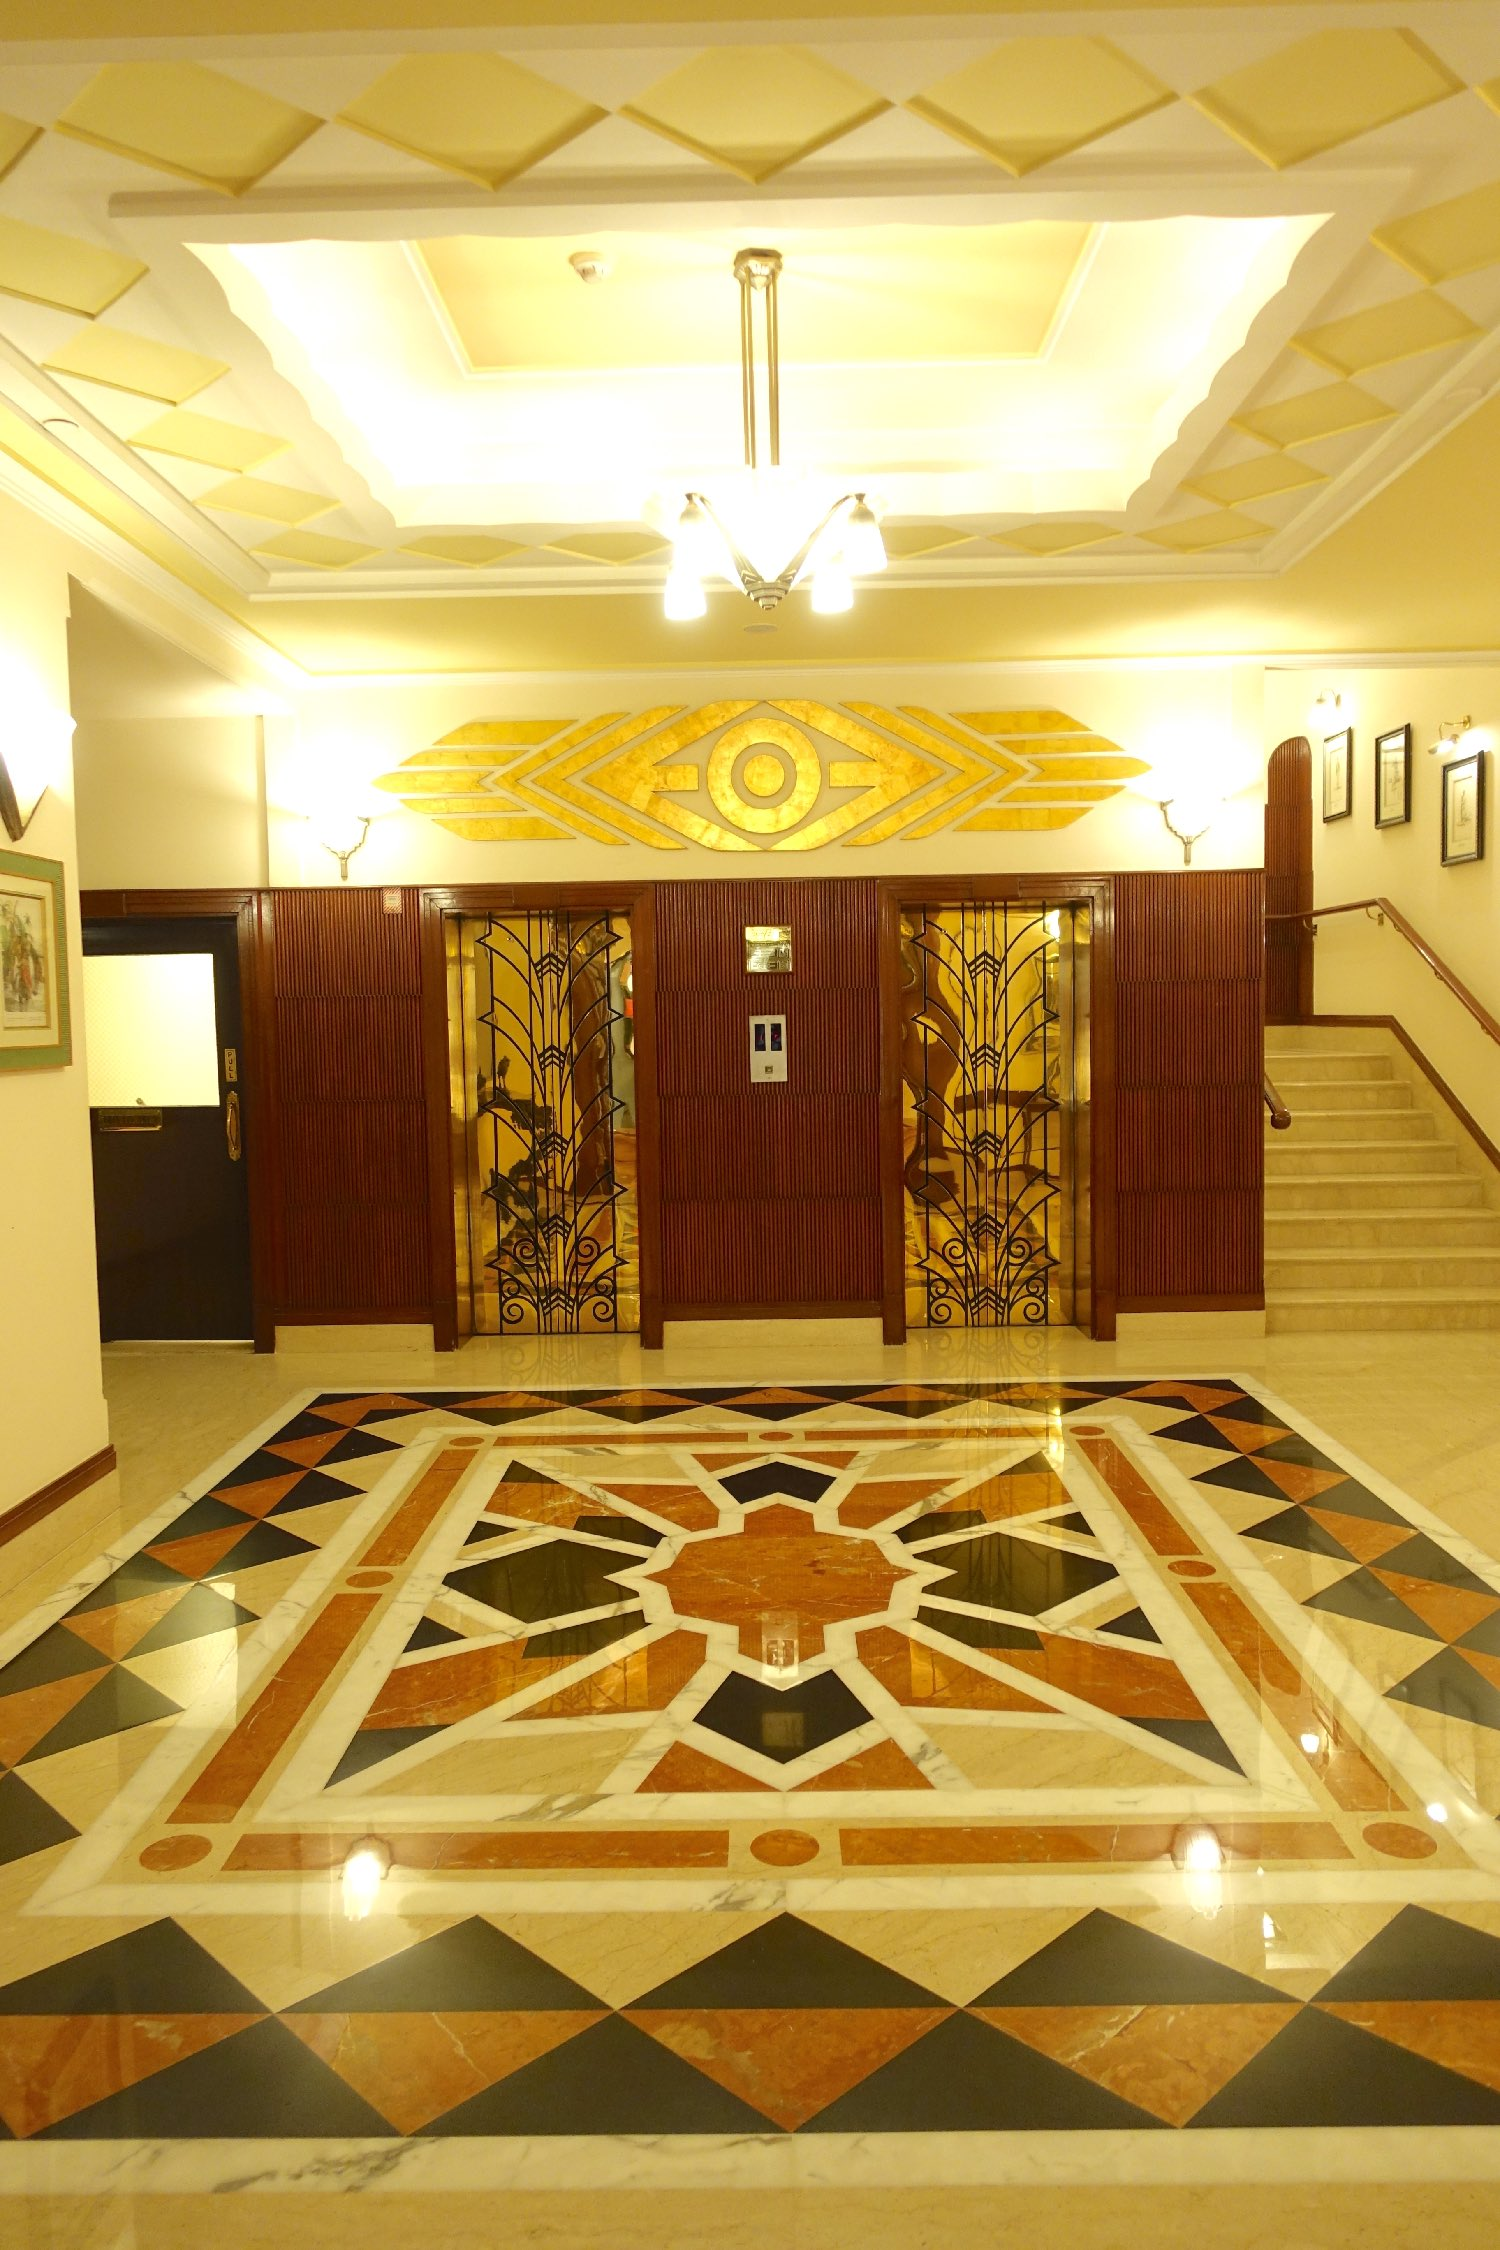 New Delhi | The Imperial Hotel | The Imperial New Delhi | Lift | Taj group | ©sandrine cohen